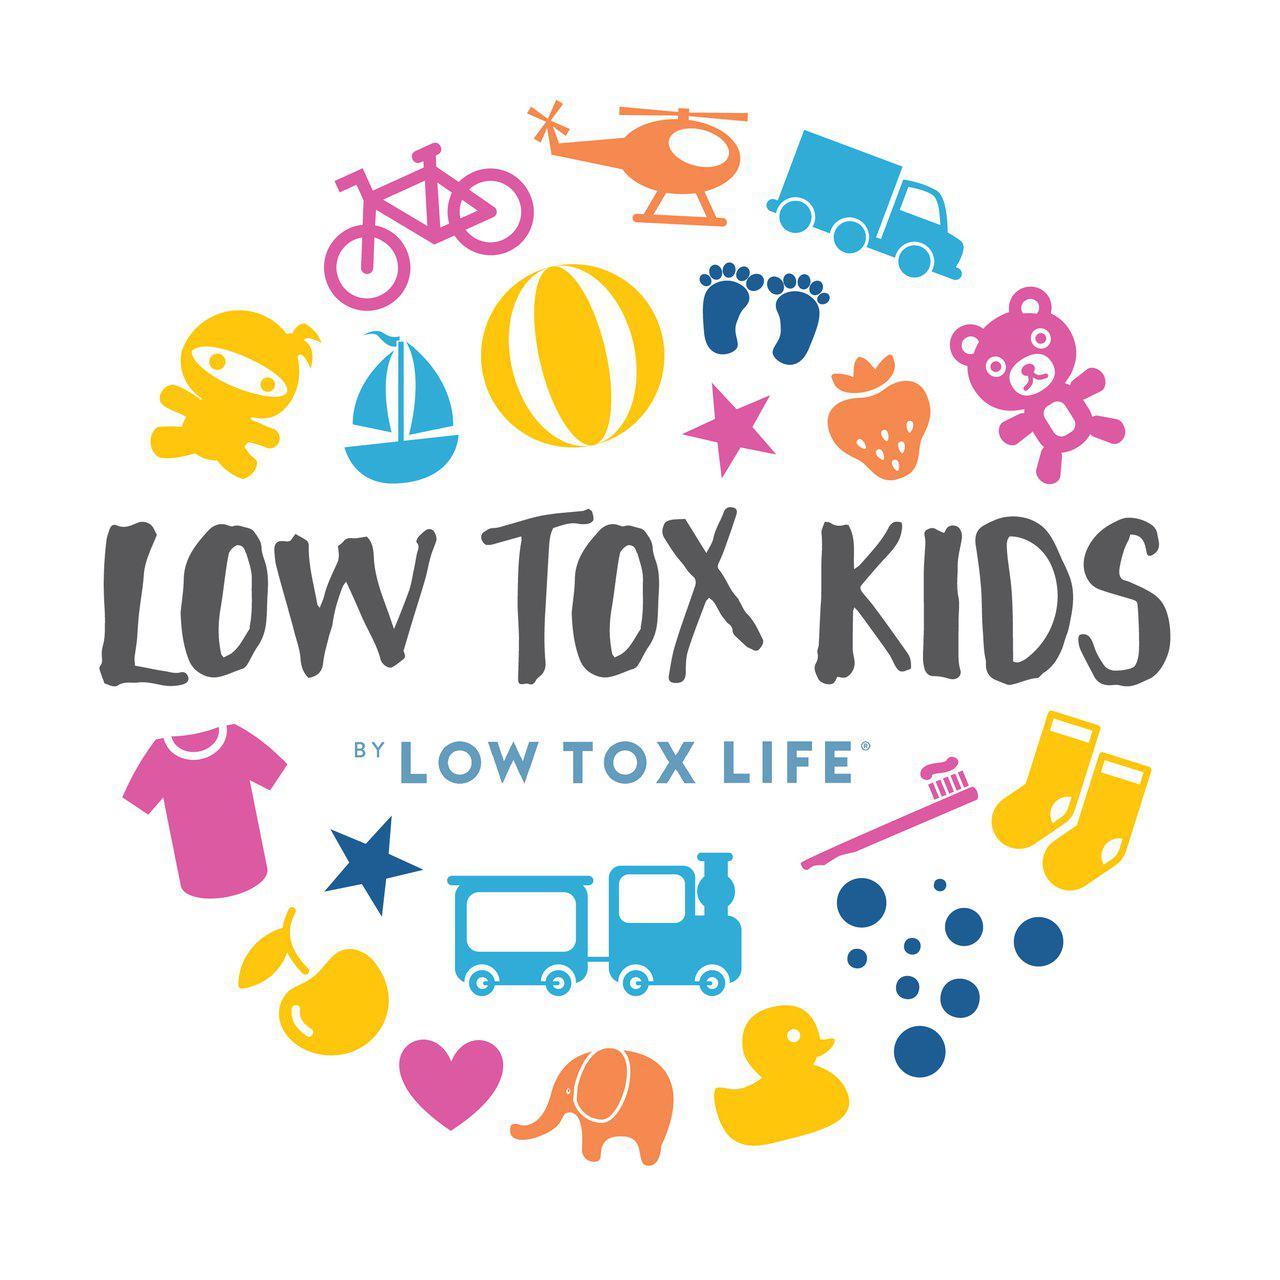 Low Tox Kids